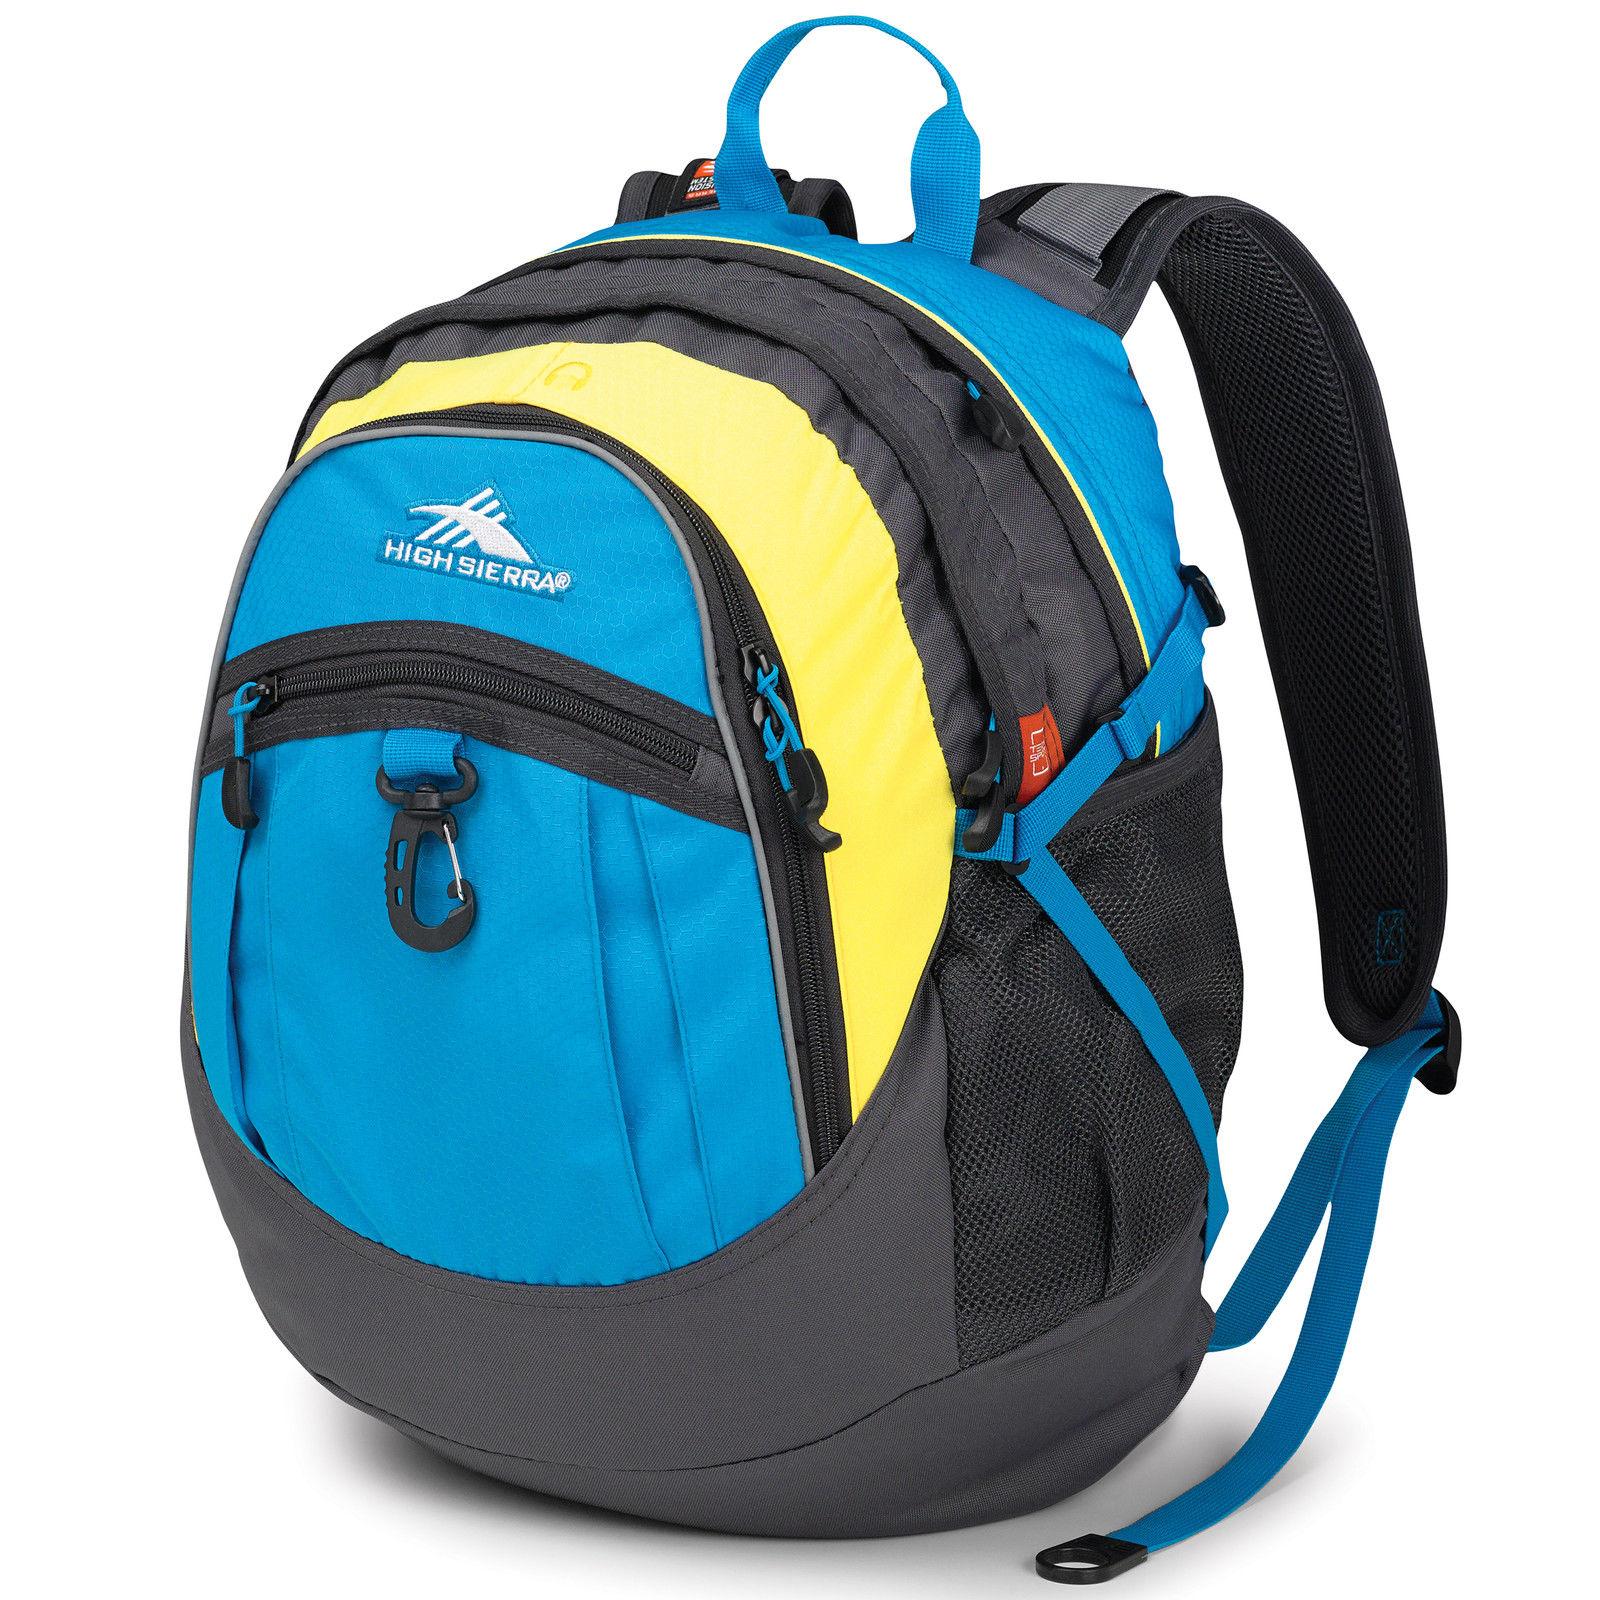 High Sierra Fat Boy Backpack Sale $14.99  Free Shipping from eBay